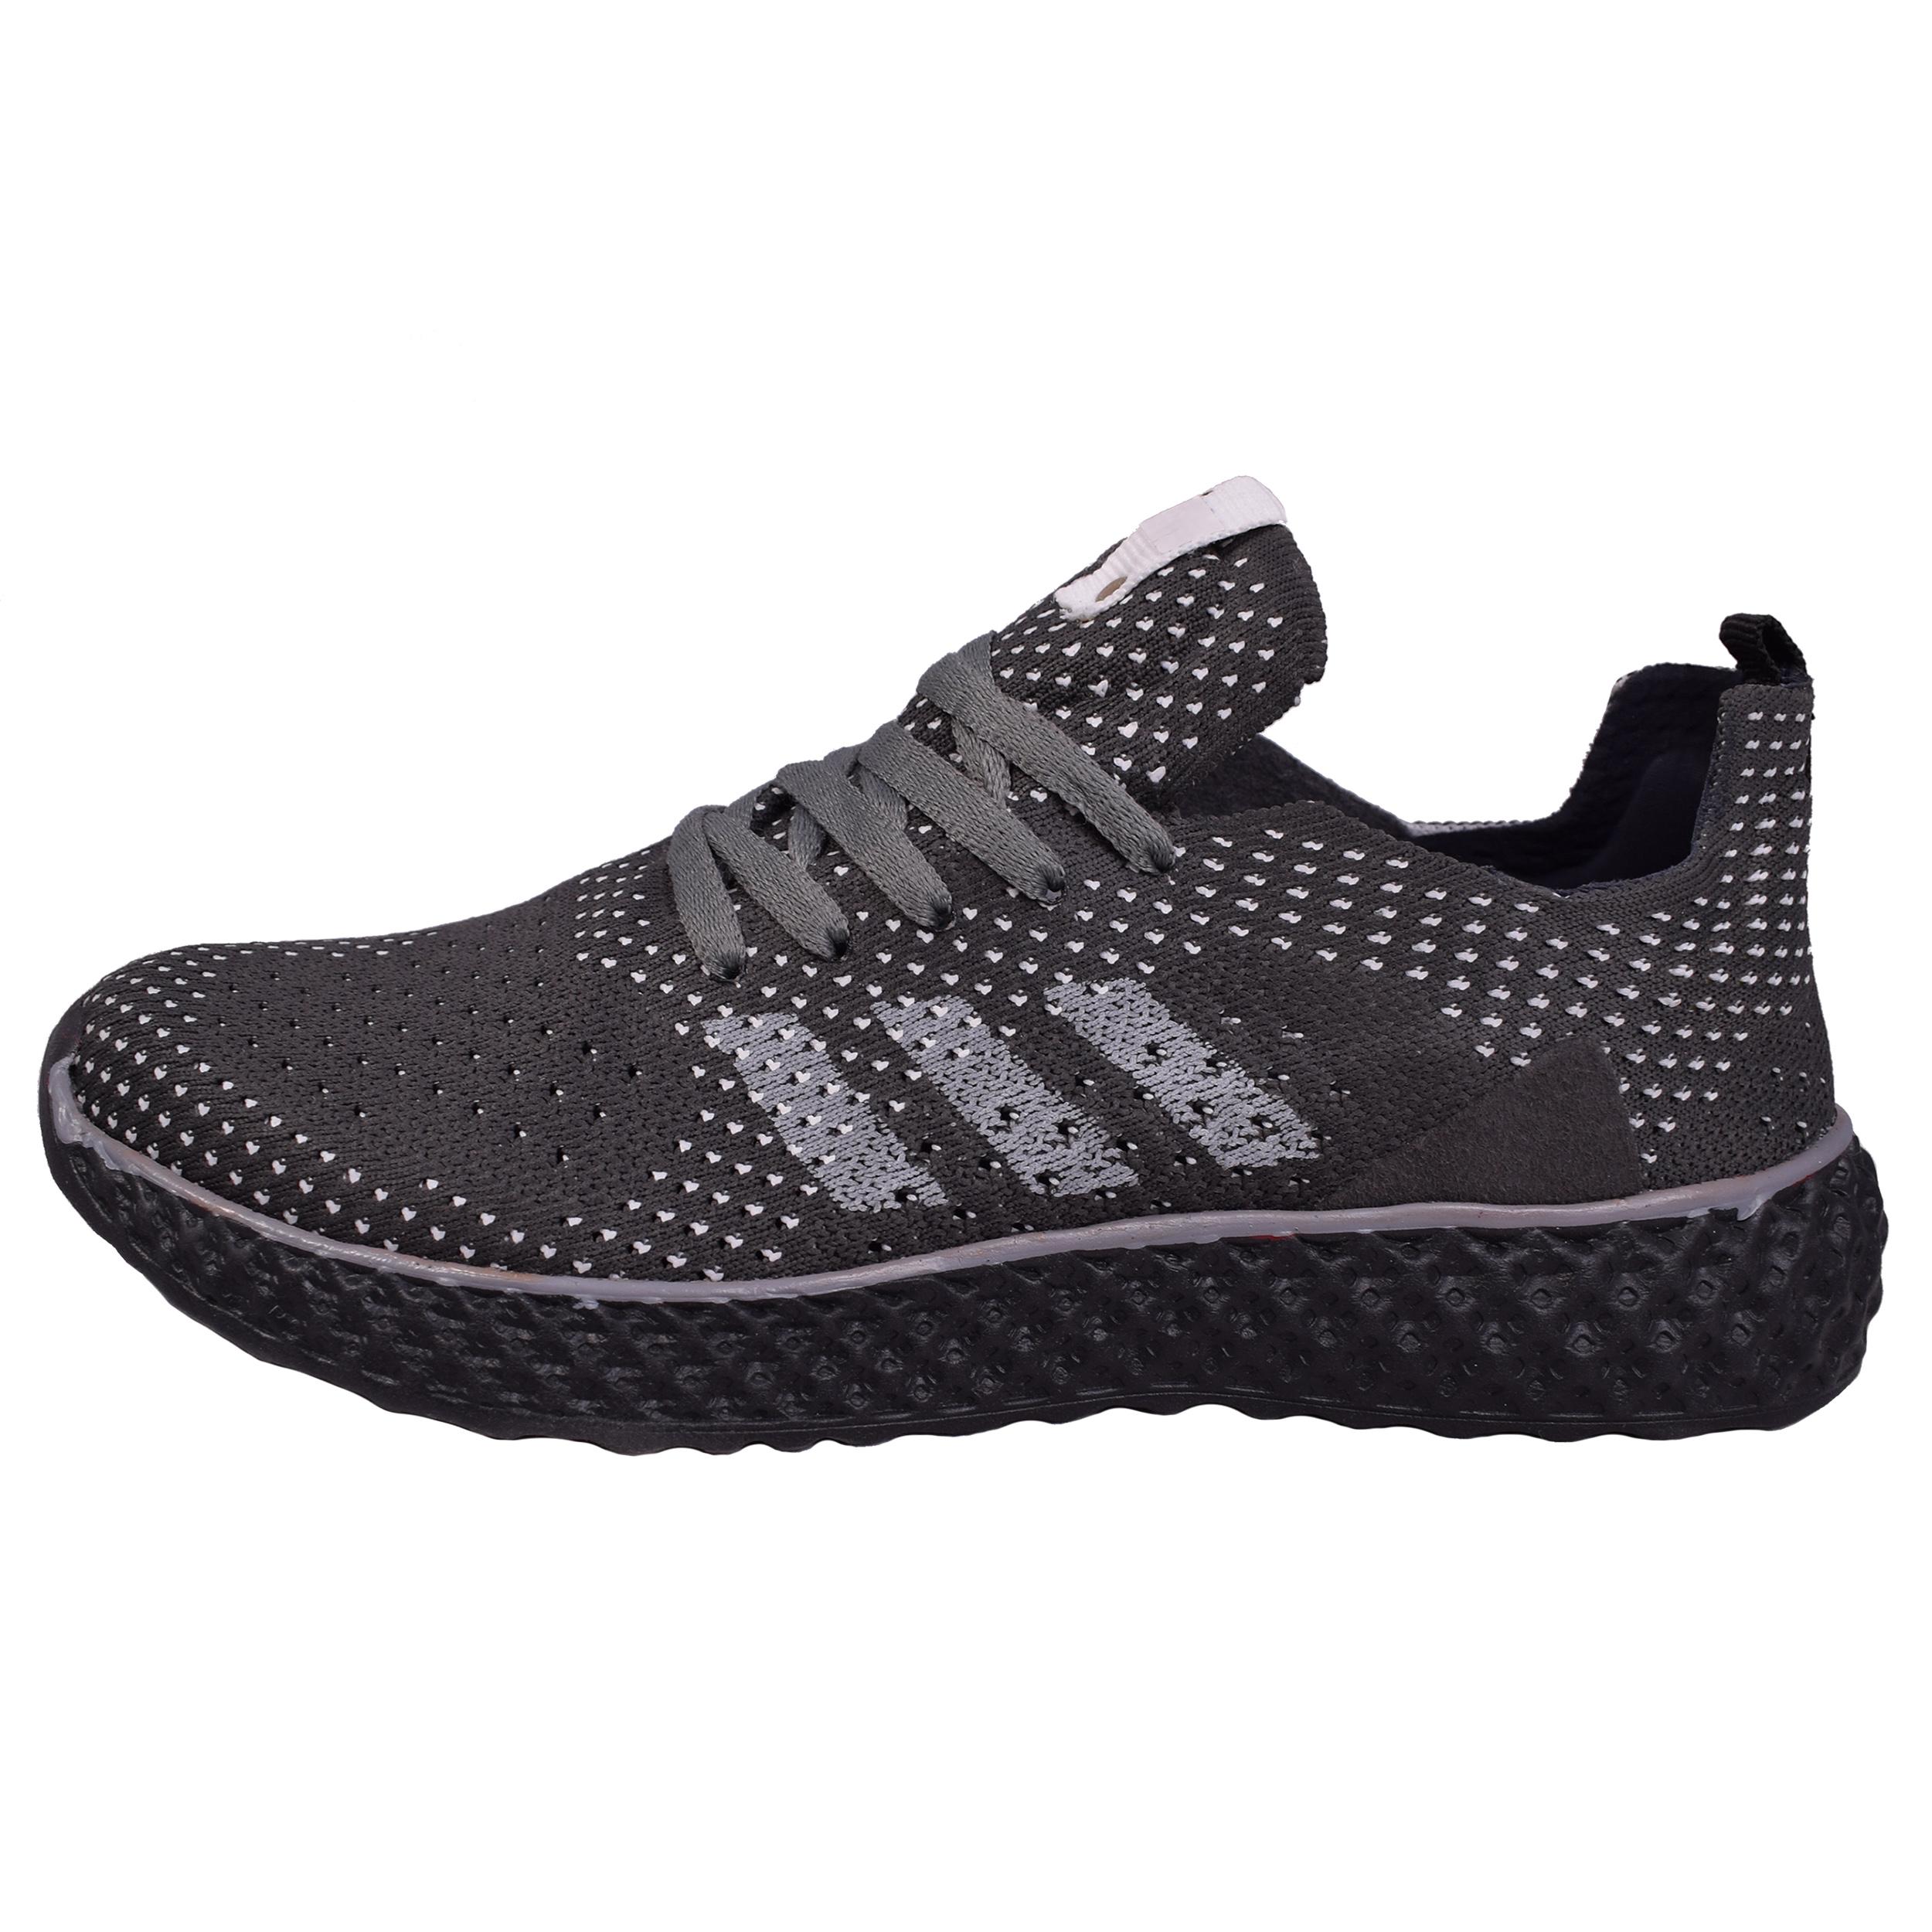 خرید                      کفش  پیاده روی مردانه مدل دنیل کد 028 - aaakk